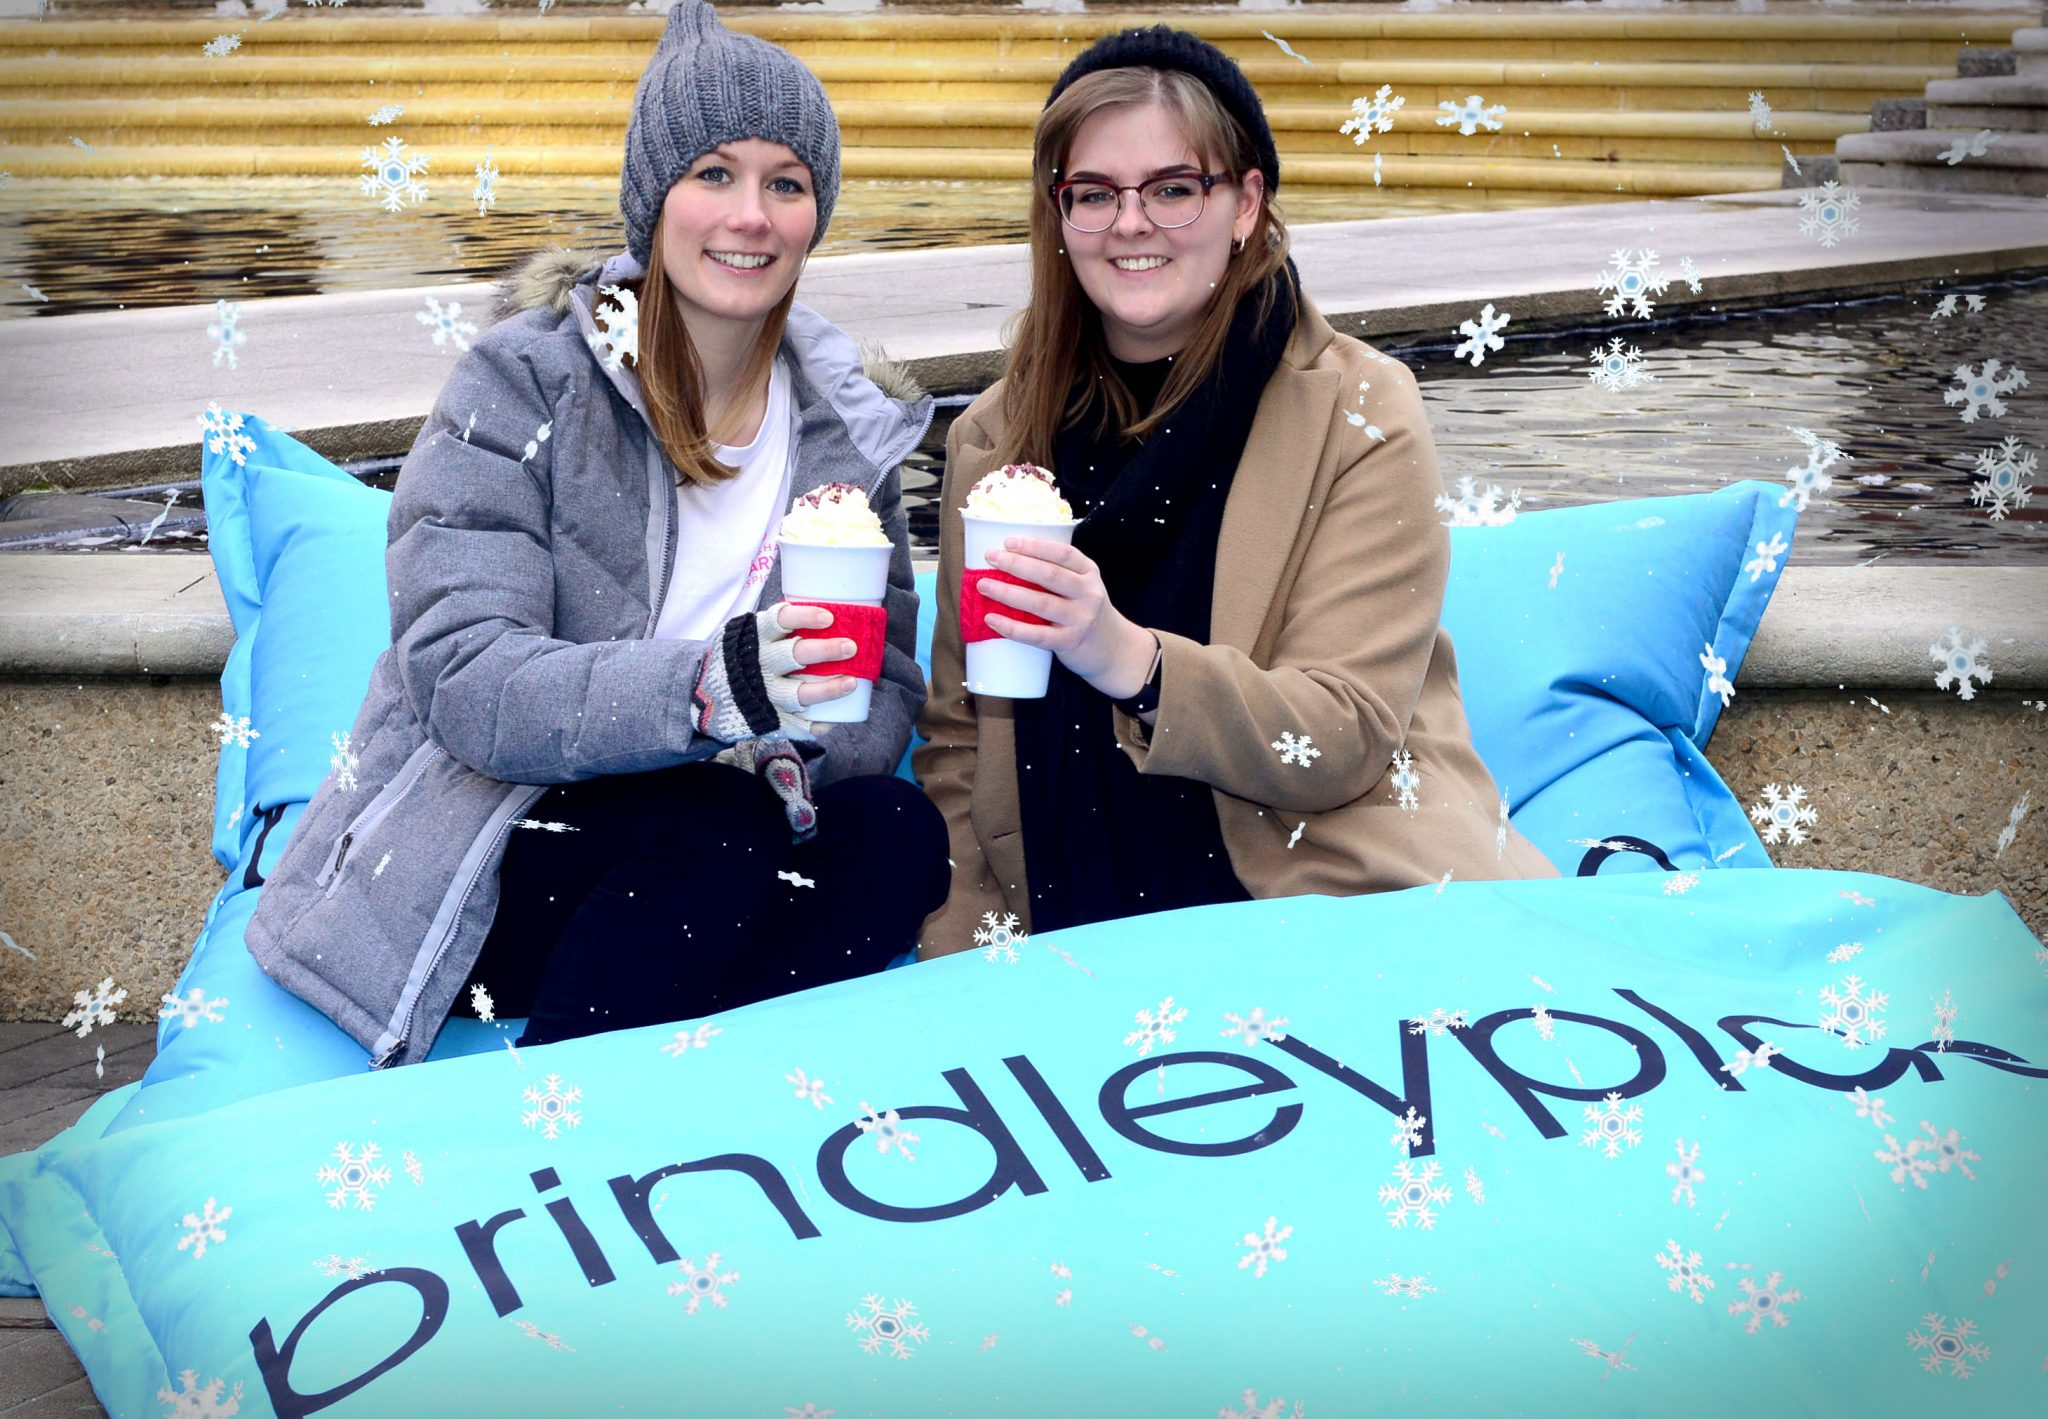 Brindleyplace